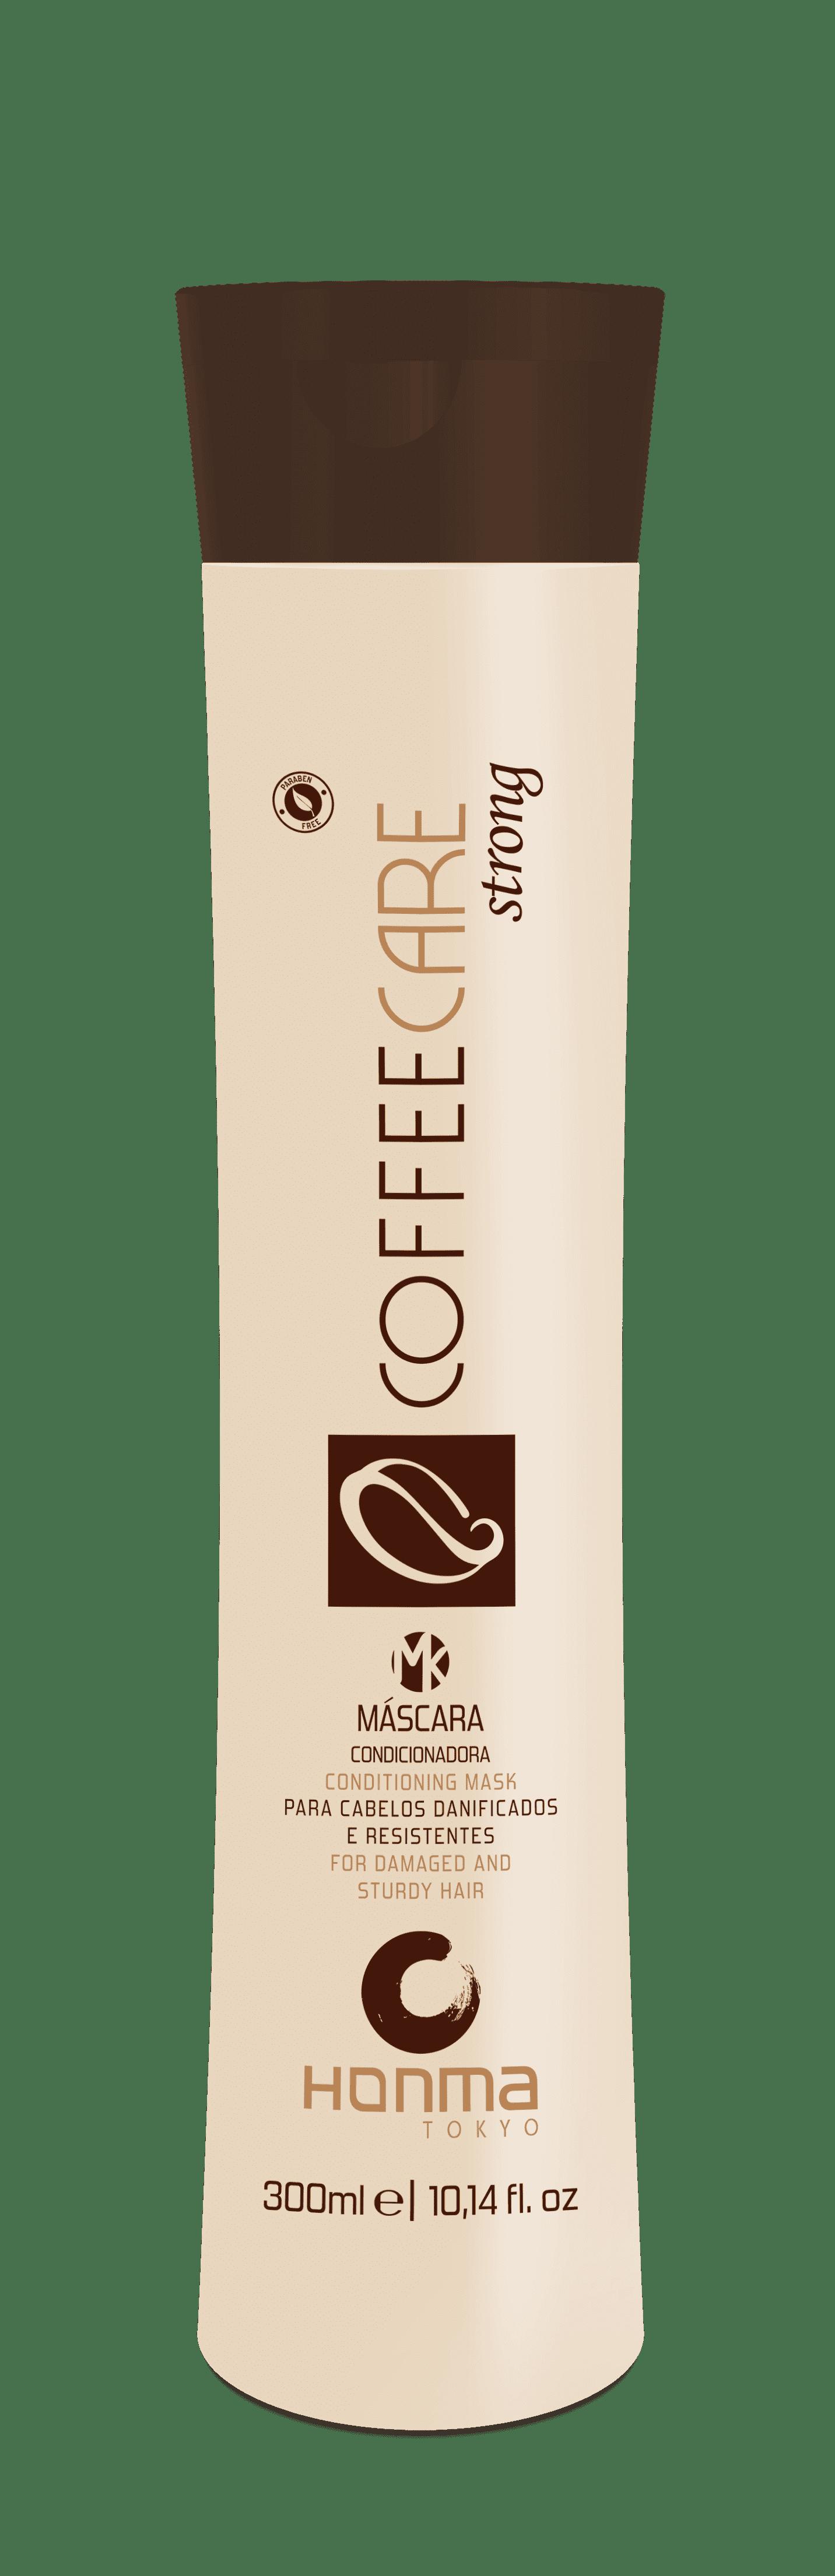 Honma Tokyo, Coffee Care Strong Кондиционирующая маска восстановление и защита, 1000 мл honma tokyo набор coffee care light шампунь 1000 мл кондиционер 1000 мл